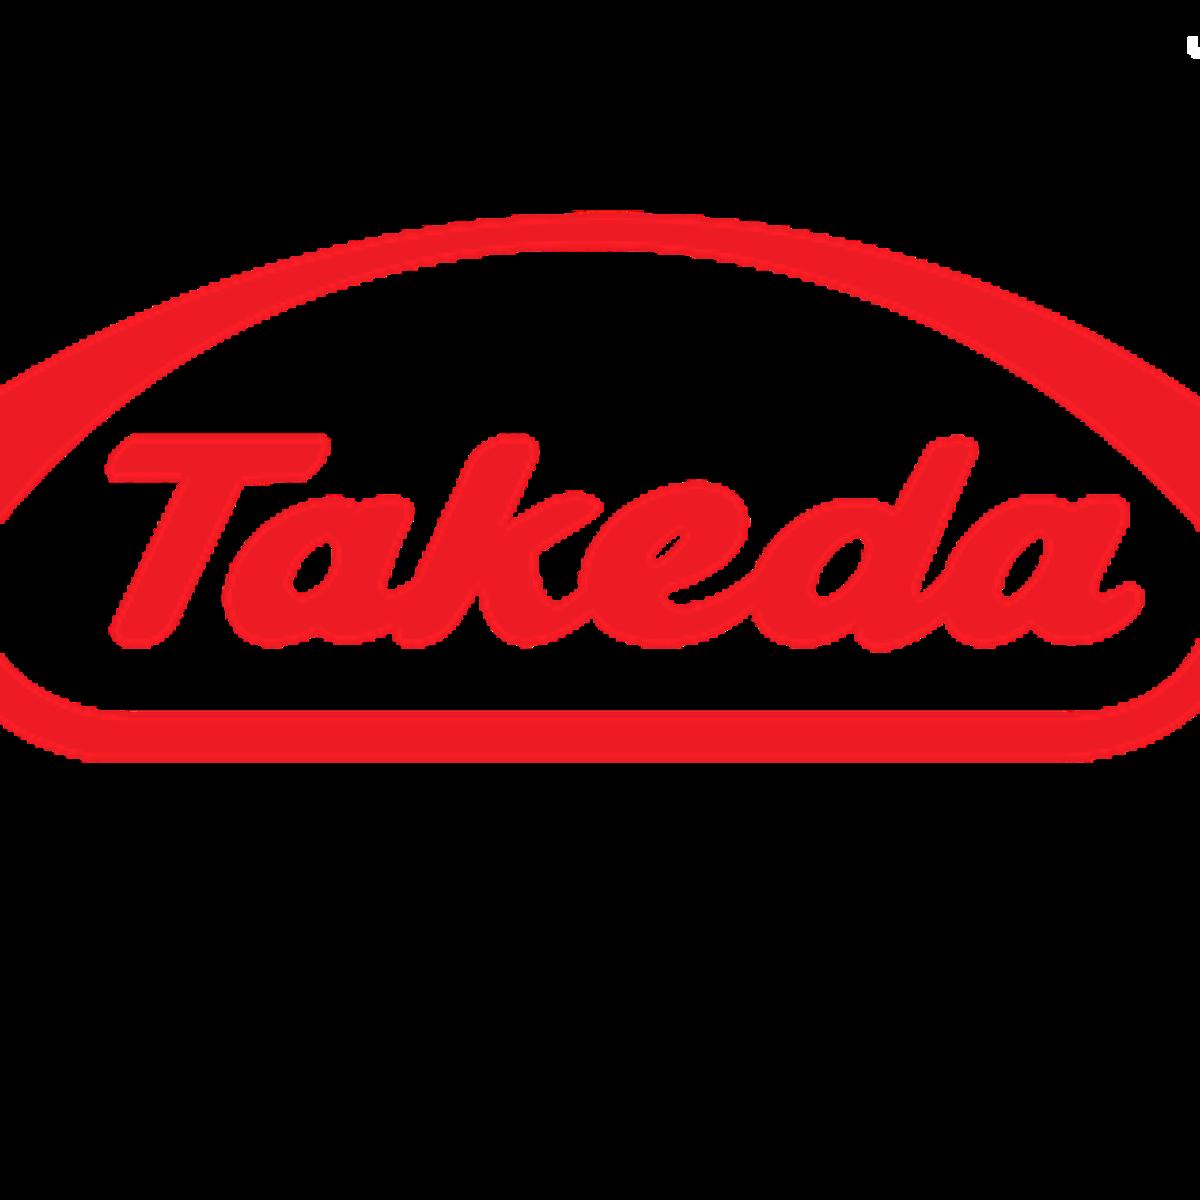 Takeda logo clipart clipart library June 2019 – Page 1231 – animesubindo.co clipart library